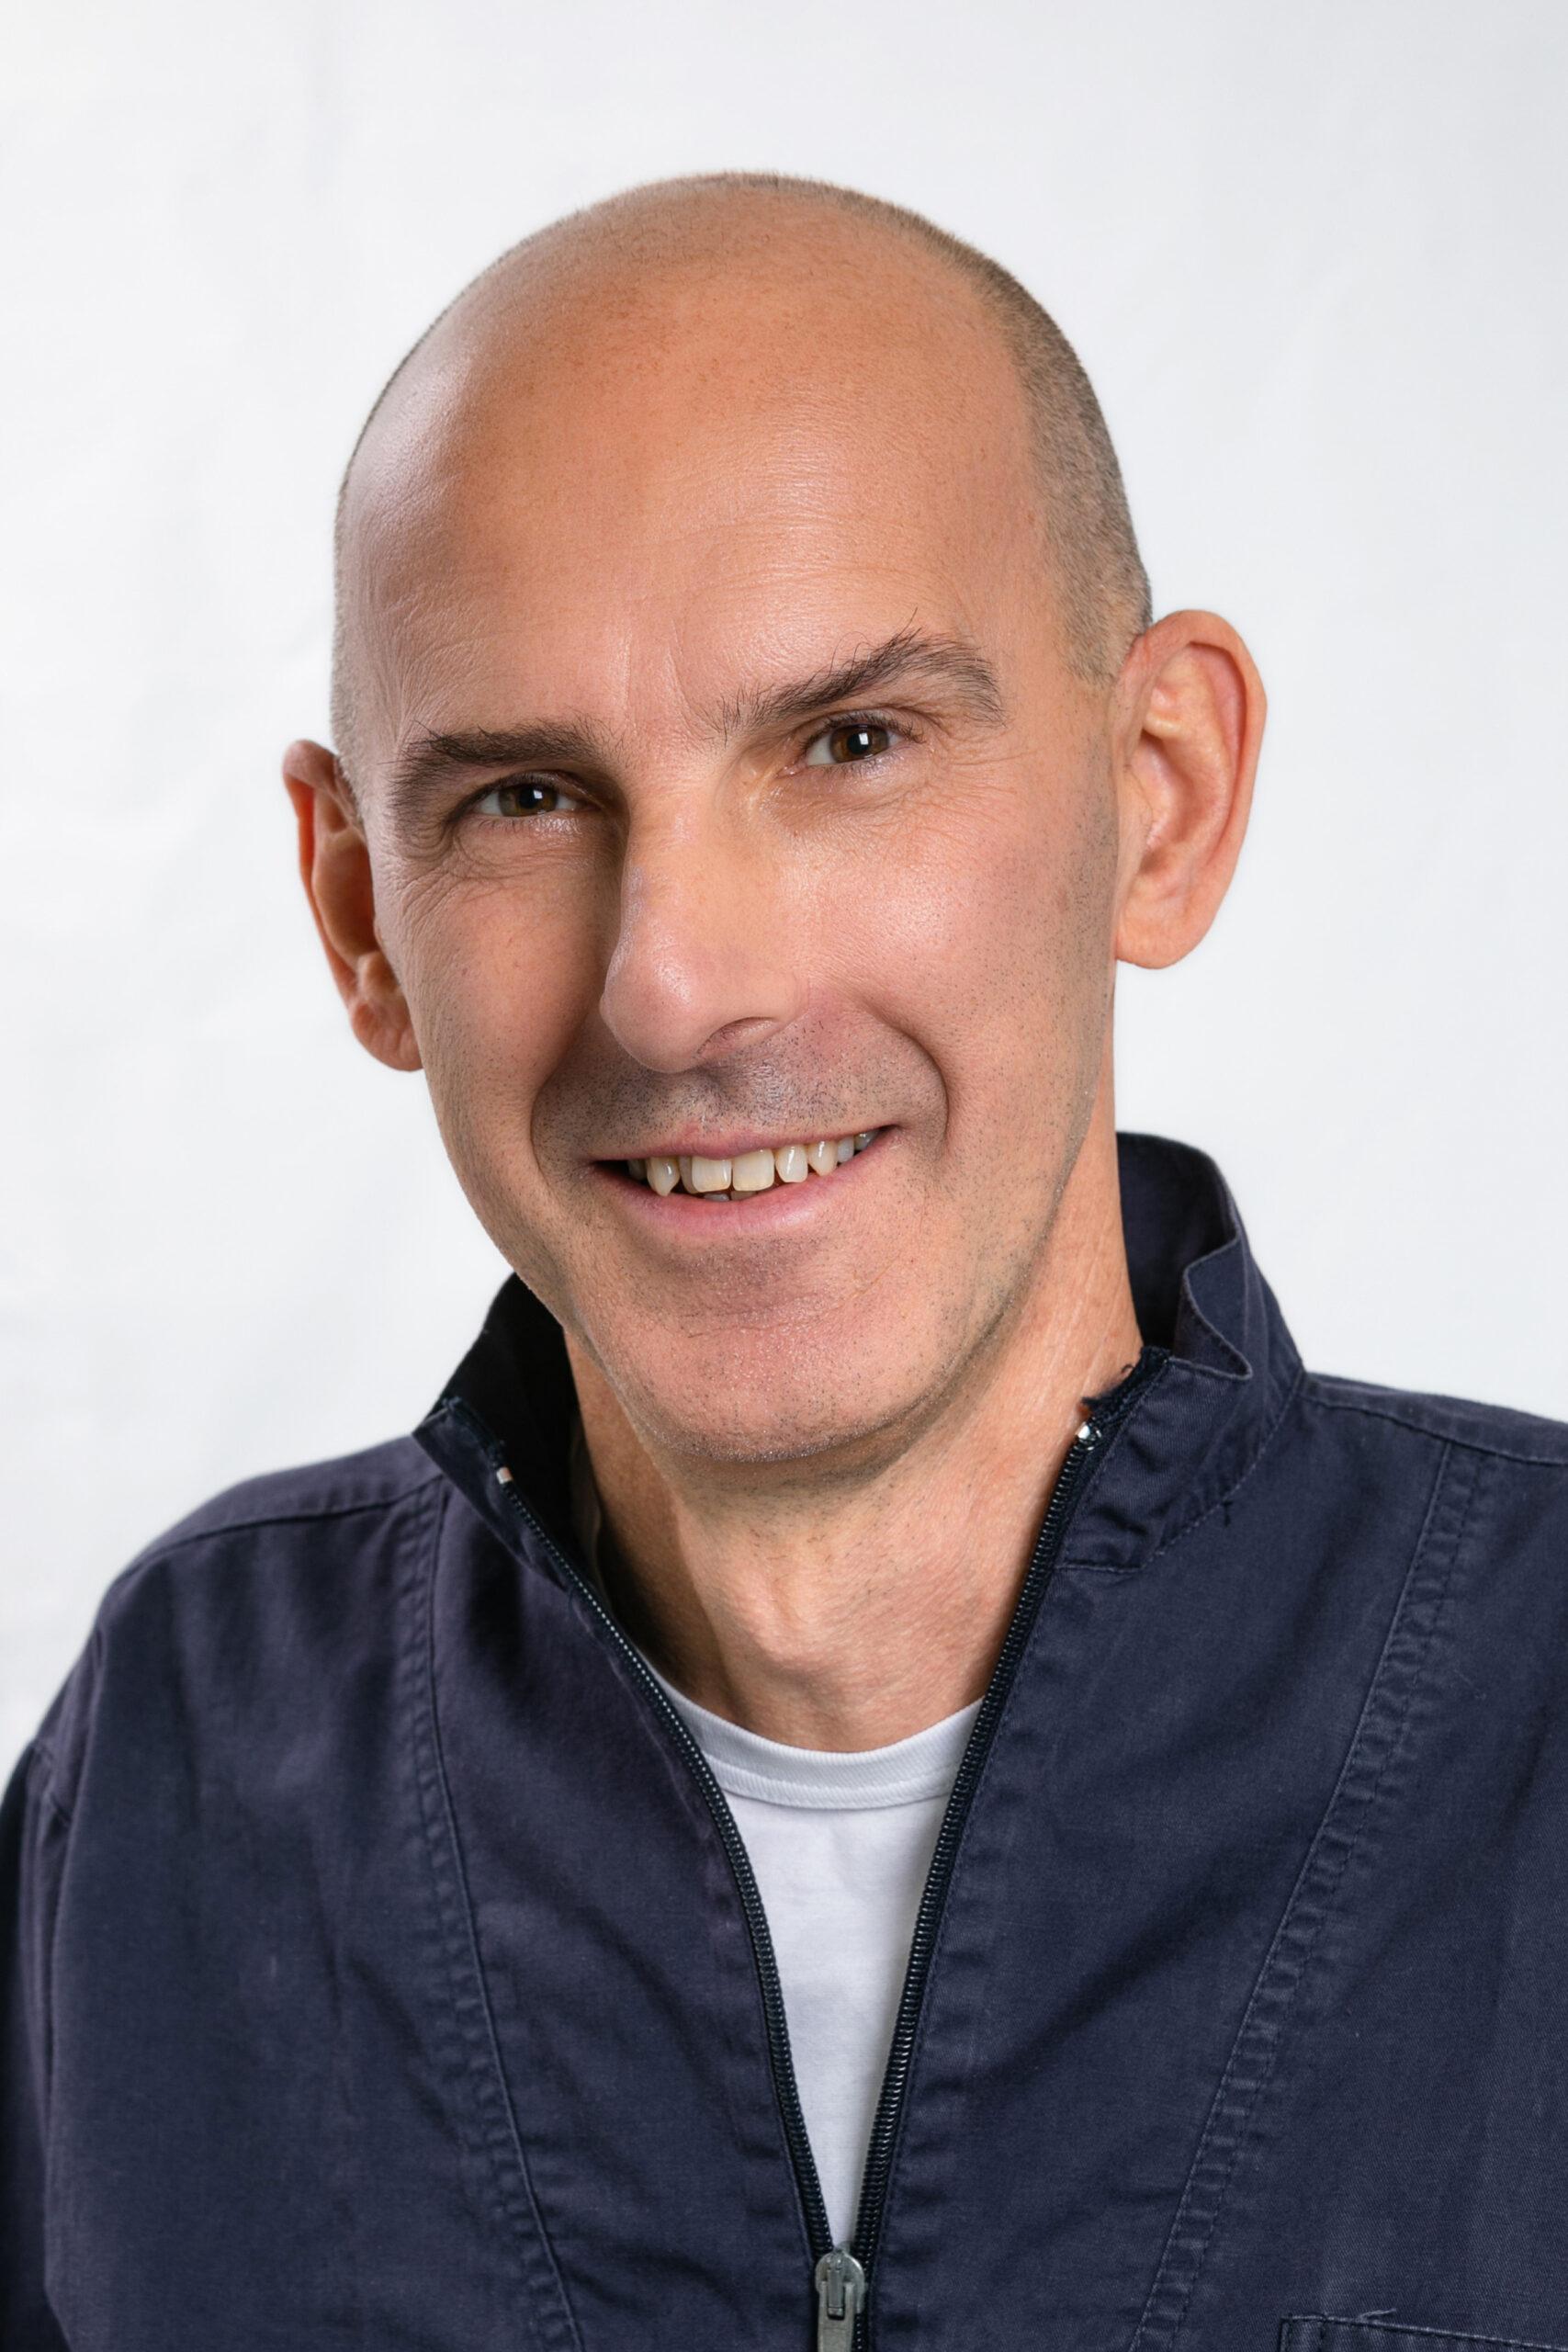 Dott. Maurizio Pezzotti